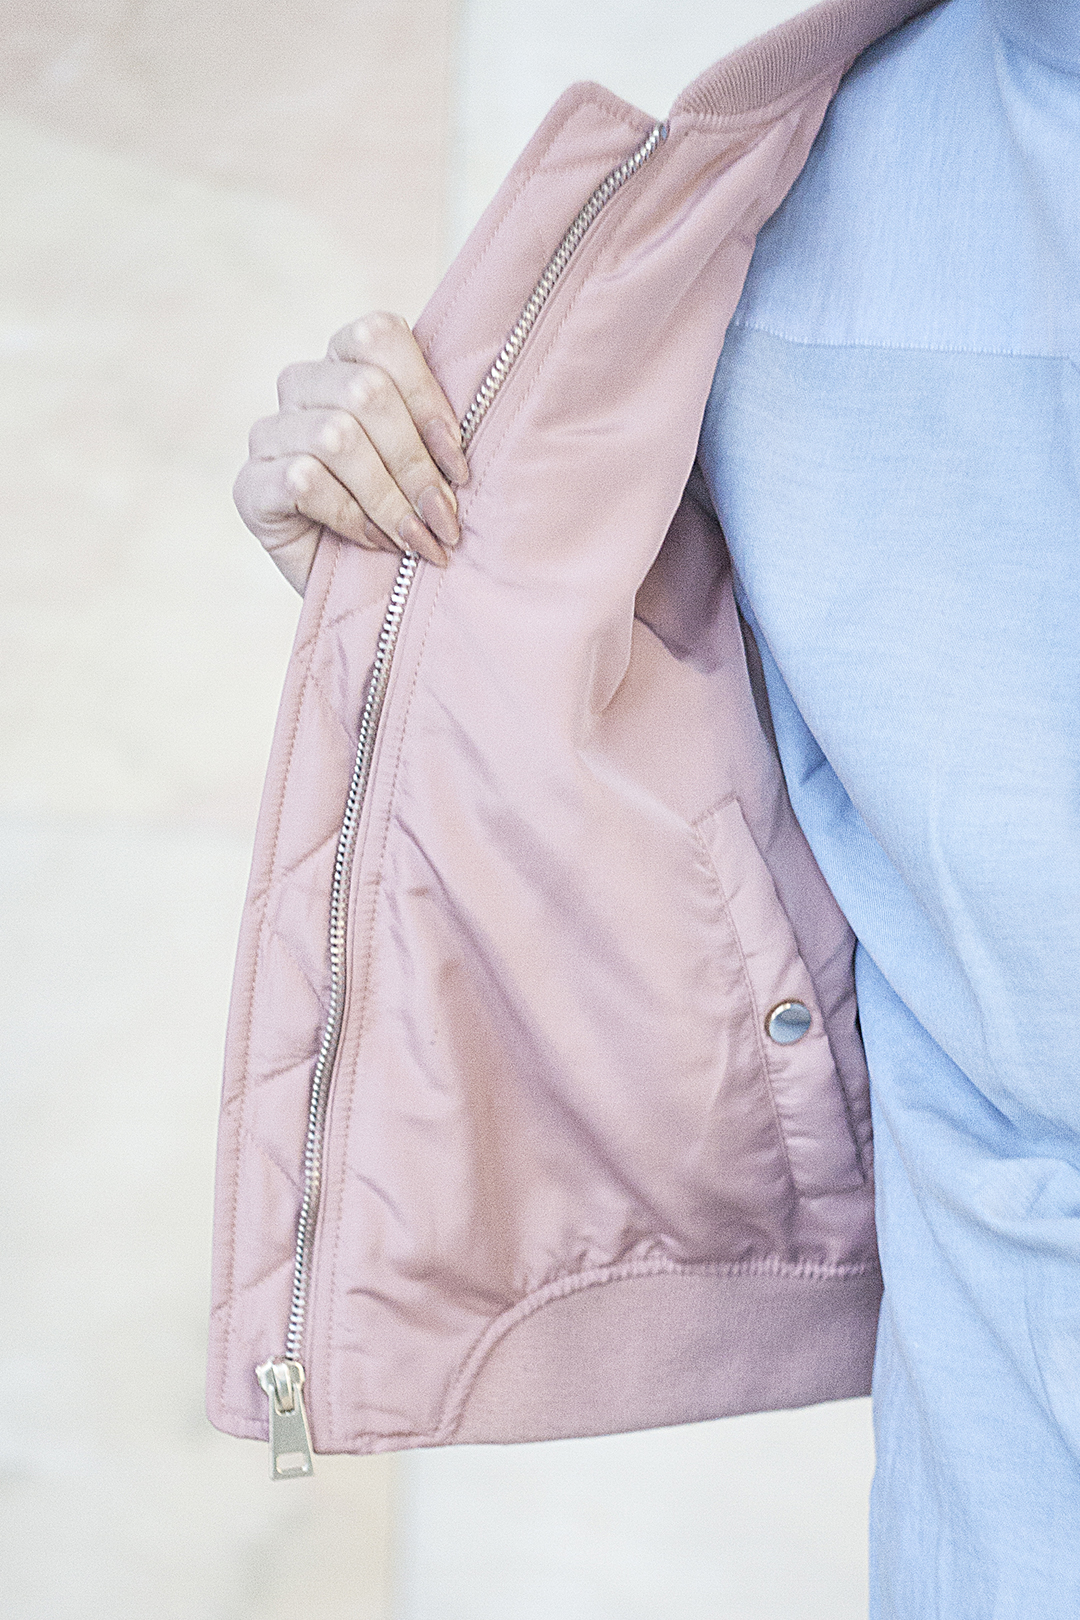 Inside out: Rediscover your wardrobe www.prettyugly.eu